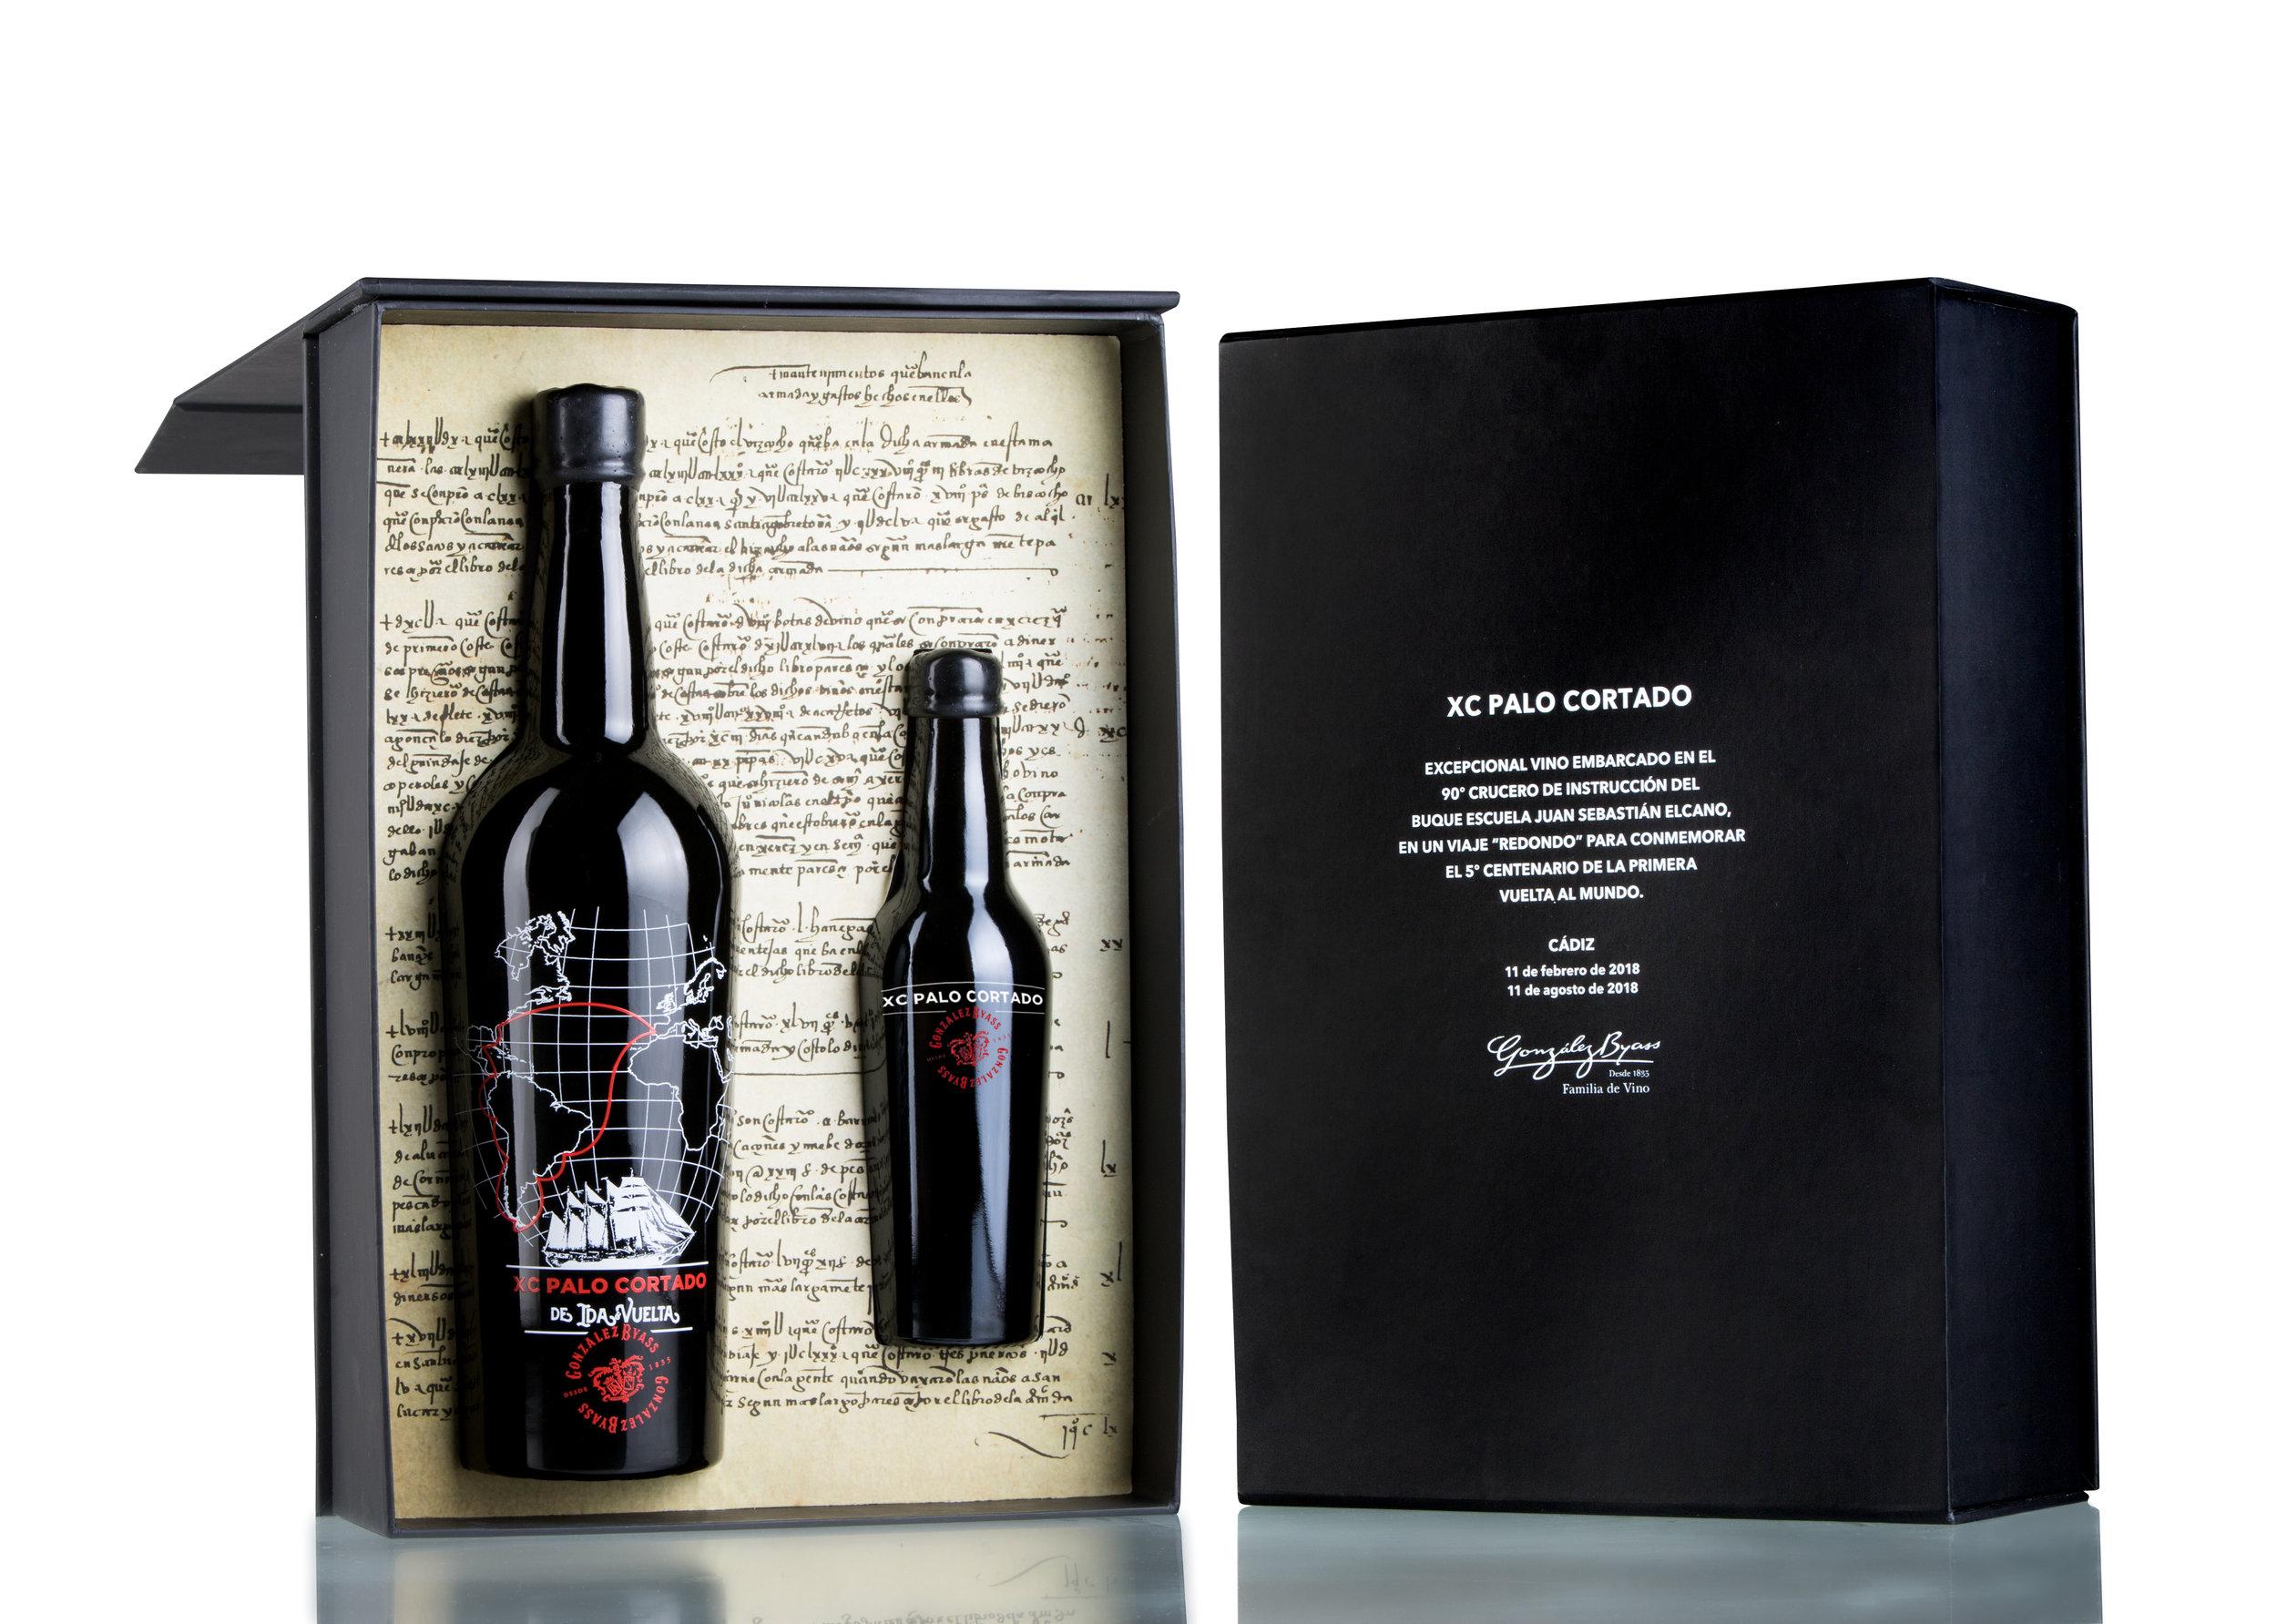 XC Palo Cortado 'Ida y vuelta' (Gonzalez Byass) Wine Packaging Design